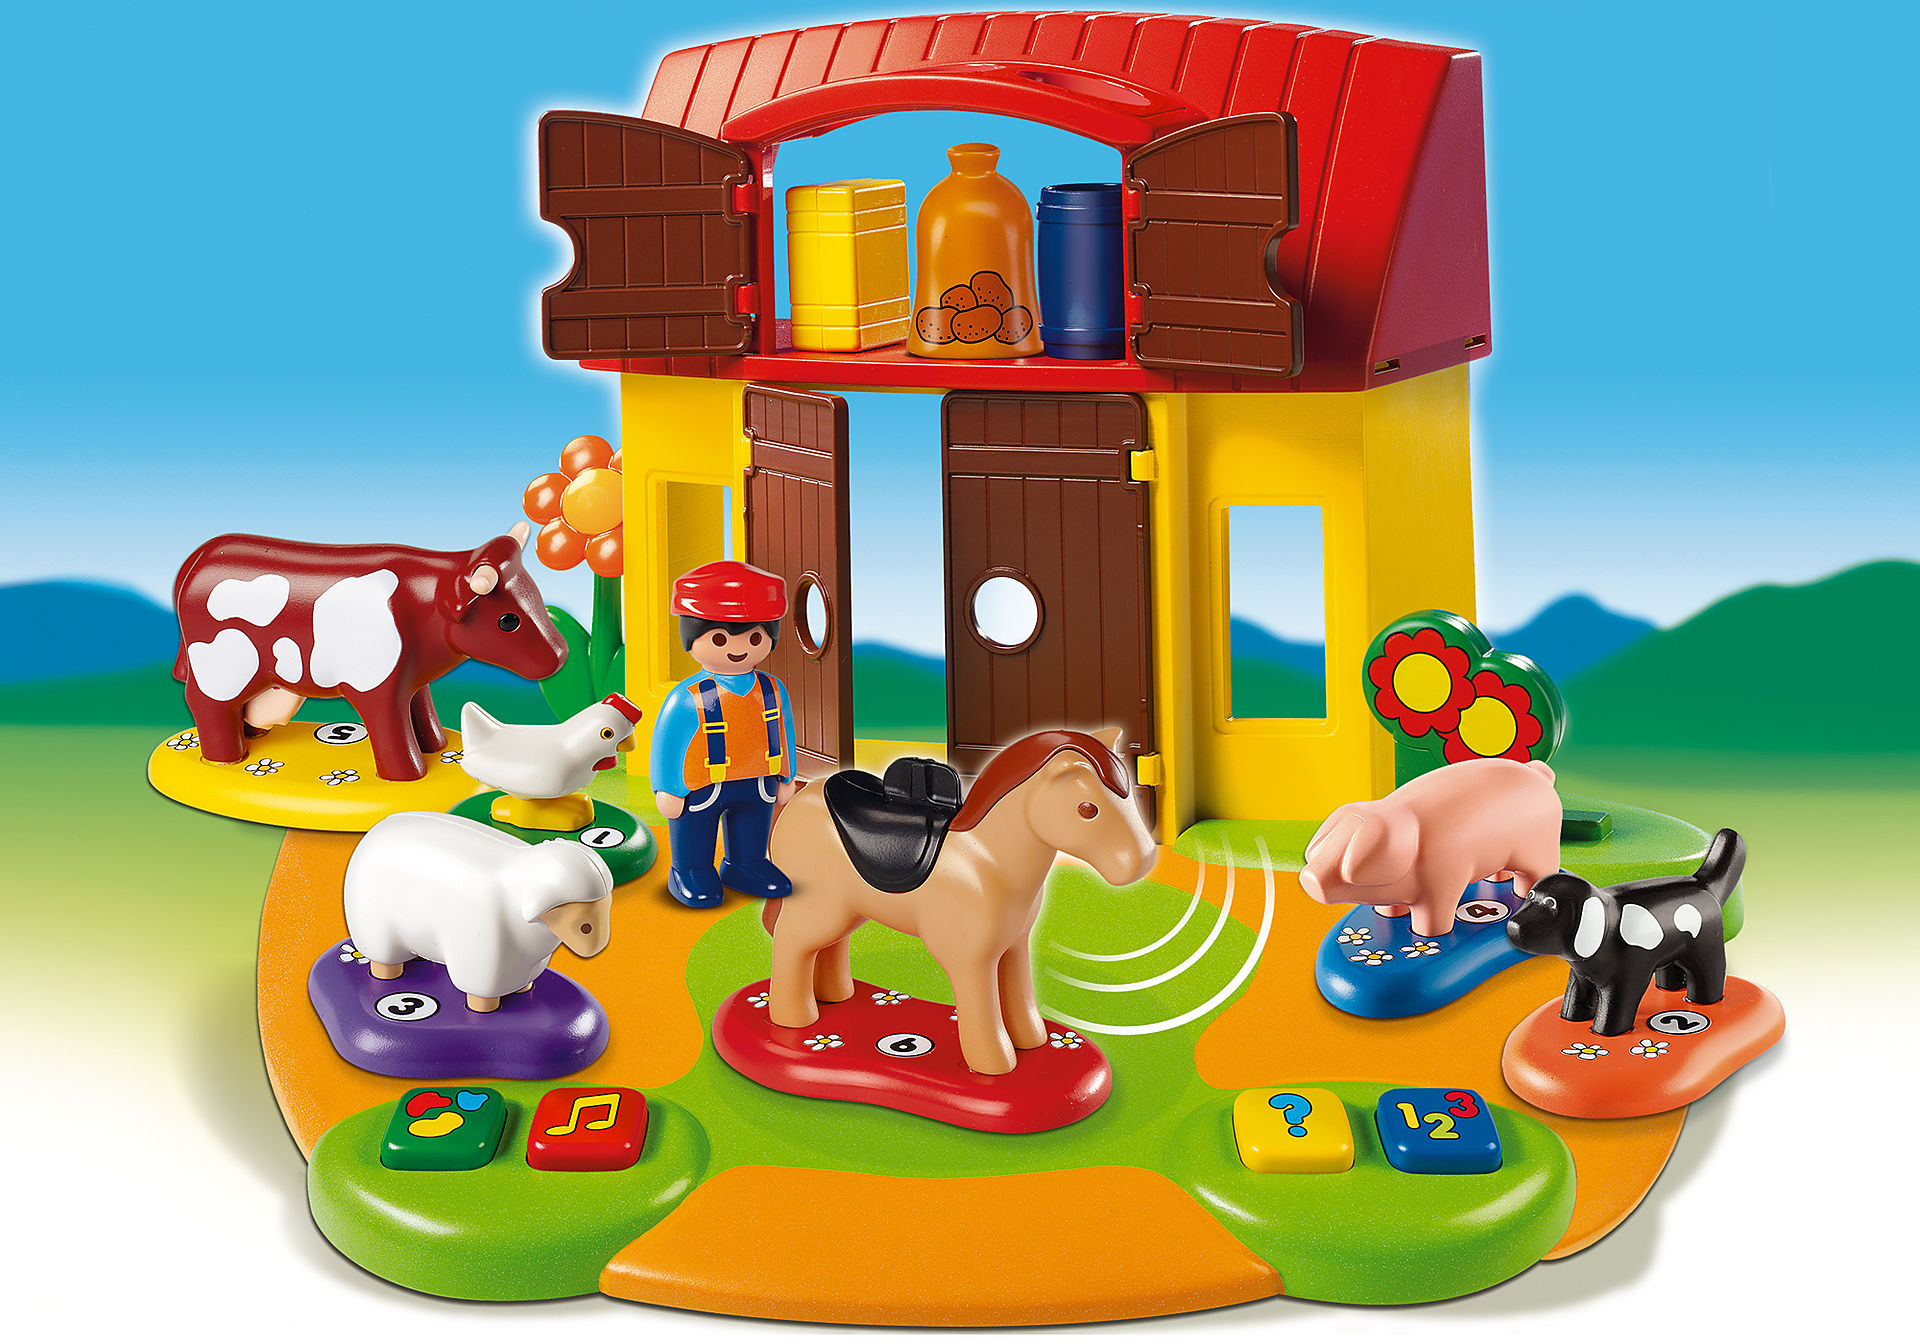 http://media.playmobil.com/i/playmobil/6766-A_product_detail/Interaktiver 1.2.3-Bauernhof